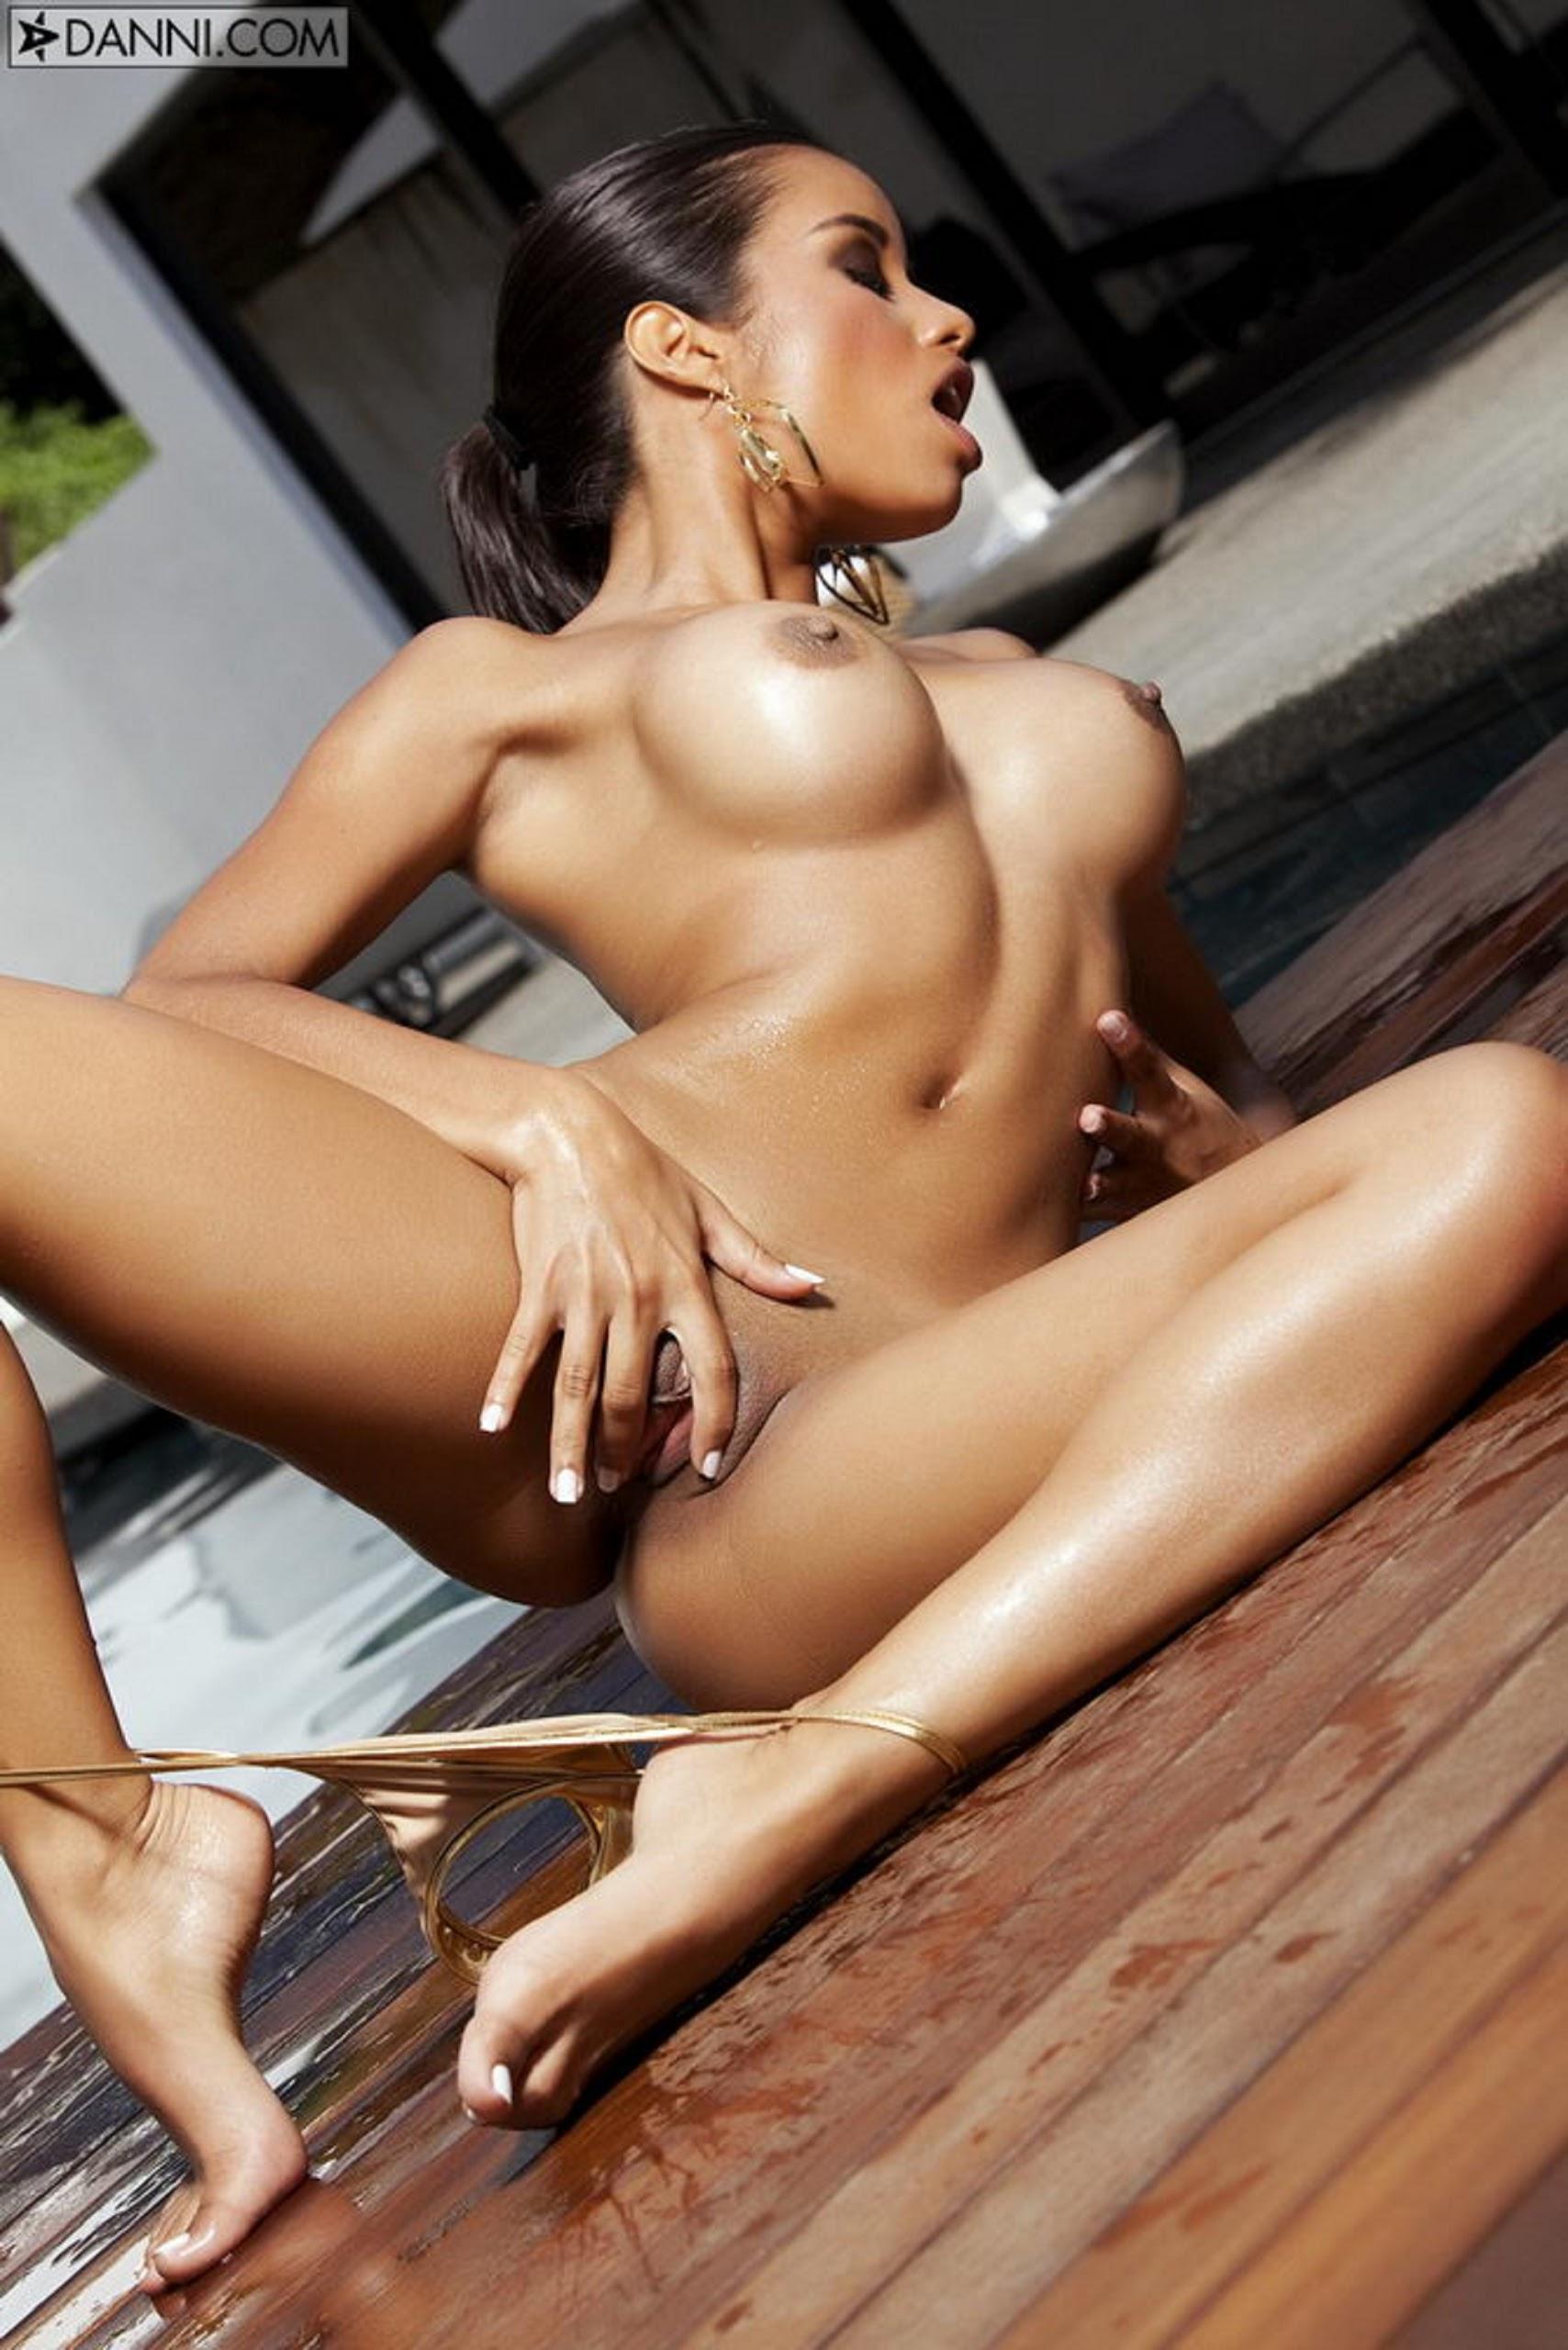 vicki chase porn movies at movs free tube videos SelenaSantana SelenaRose POVD Latina Pussy Vagina Butt Ass Spreadingpussy Pussyspread Showingpussy